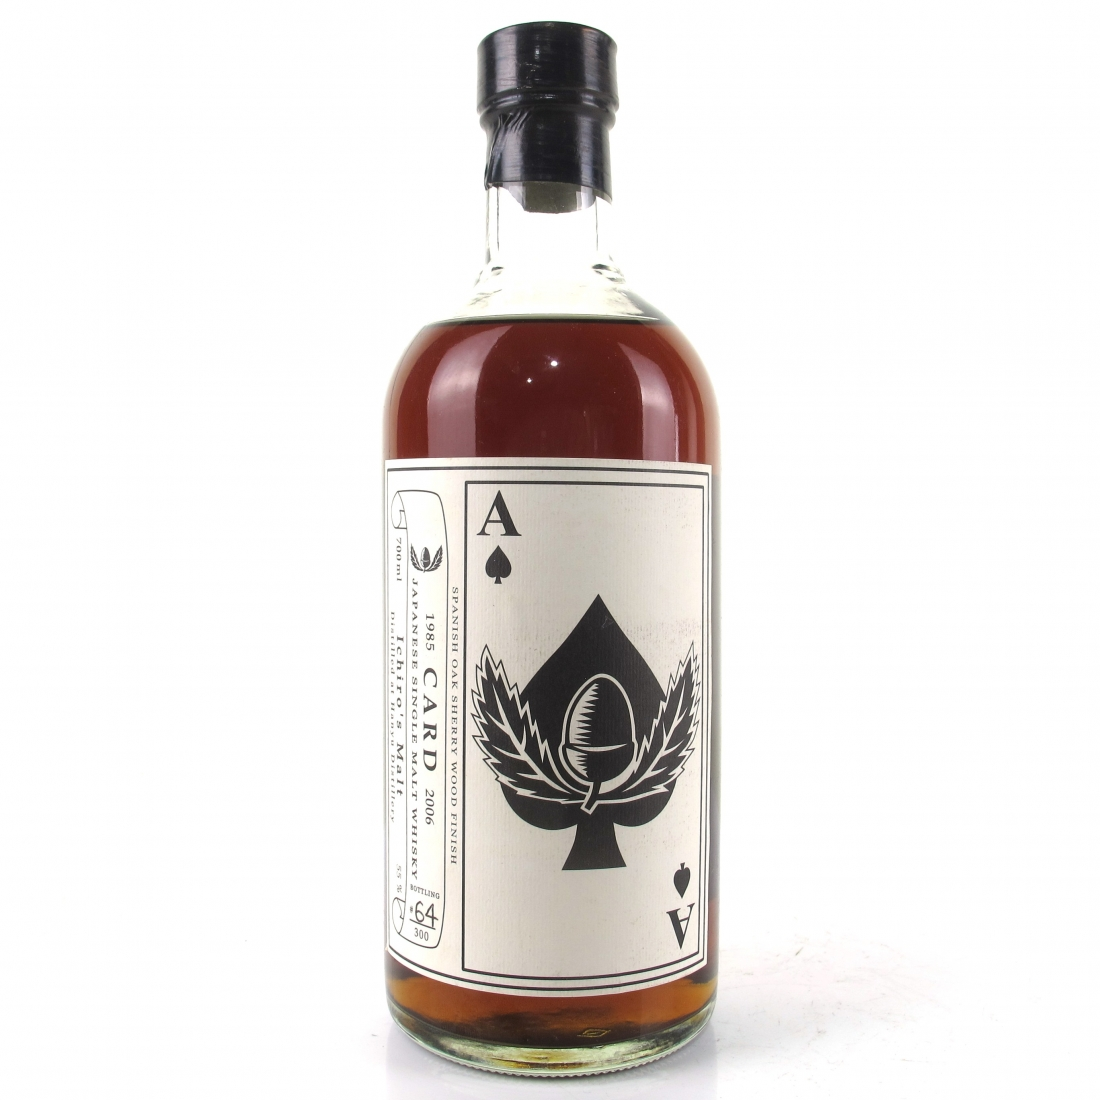 Hanyu 1985 Ace of Spades Single Cask #9308